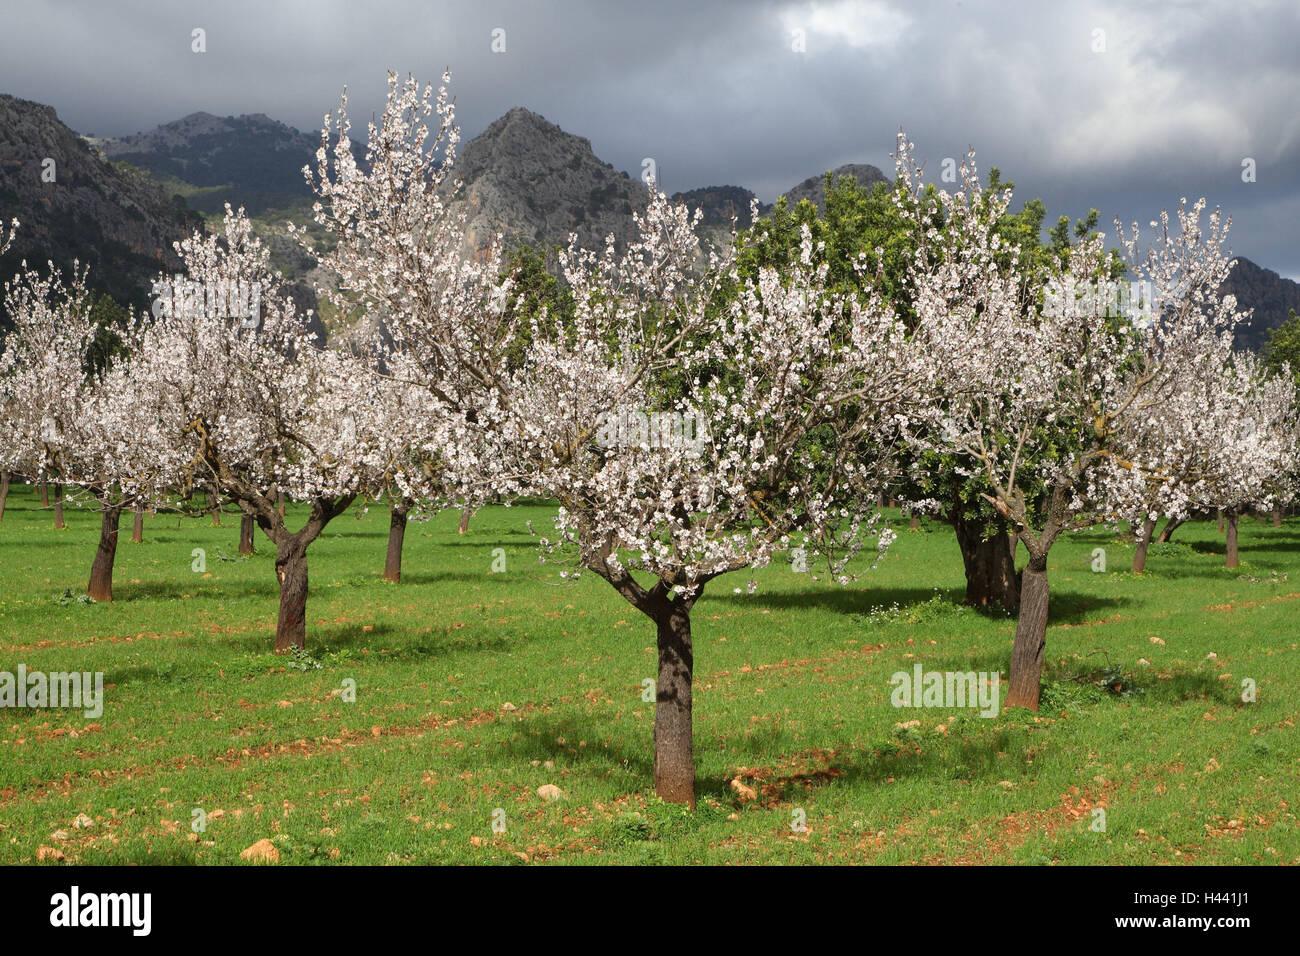 Mallorca paisaje de monta a almendros en flor espa a for Arboles de hoja perenne para clima mediterraneo